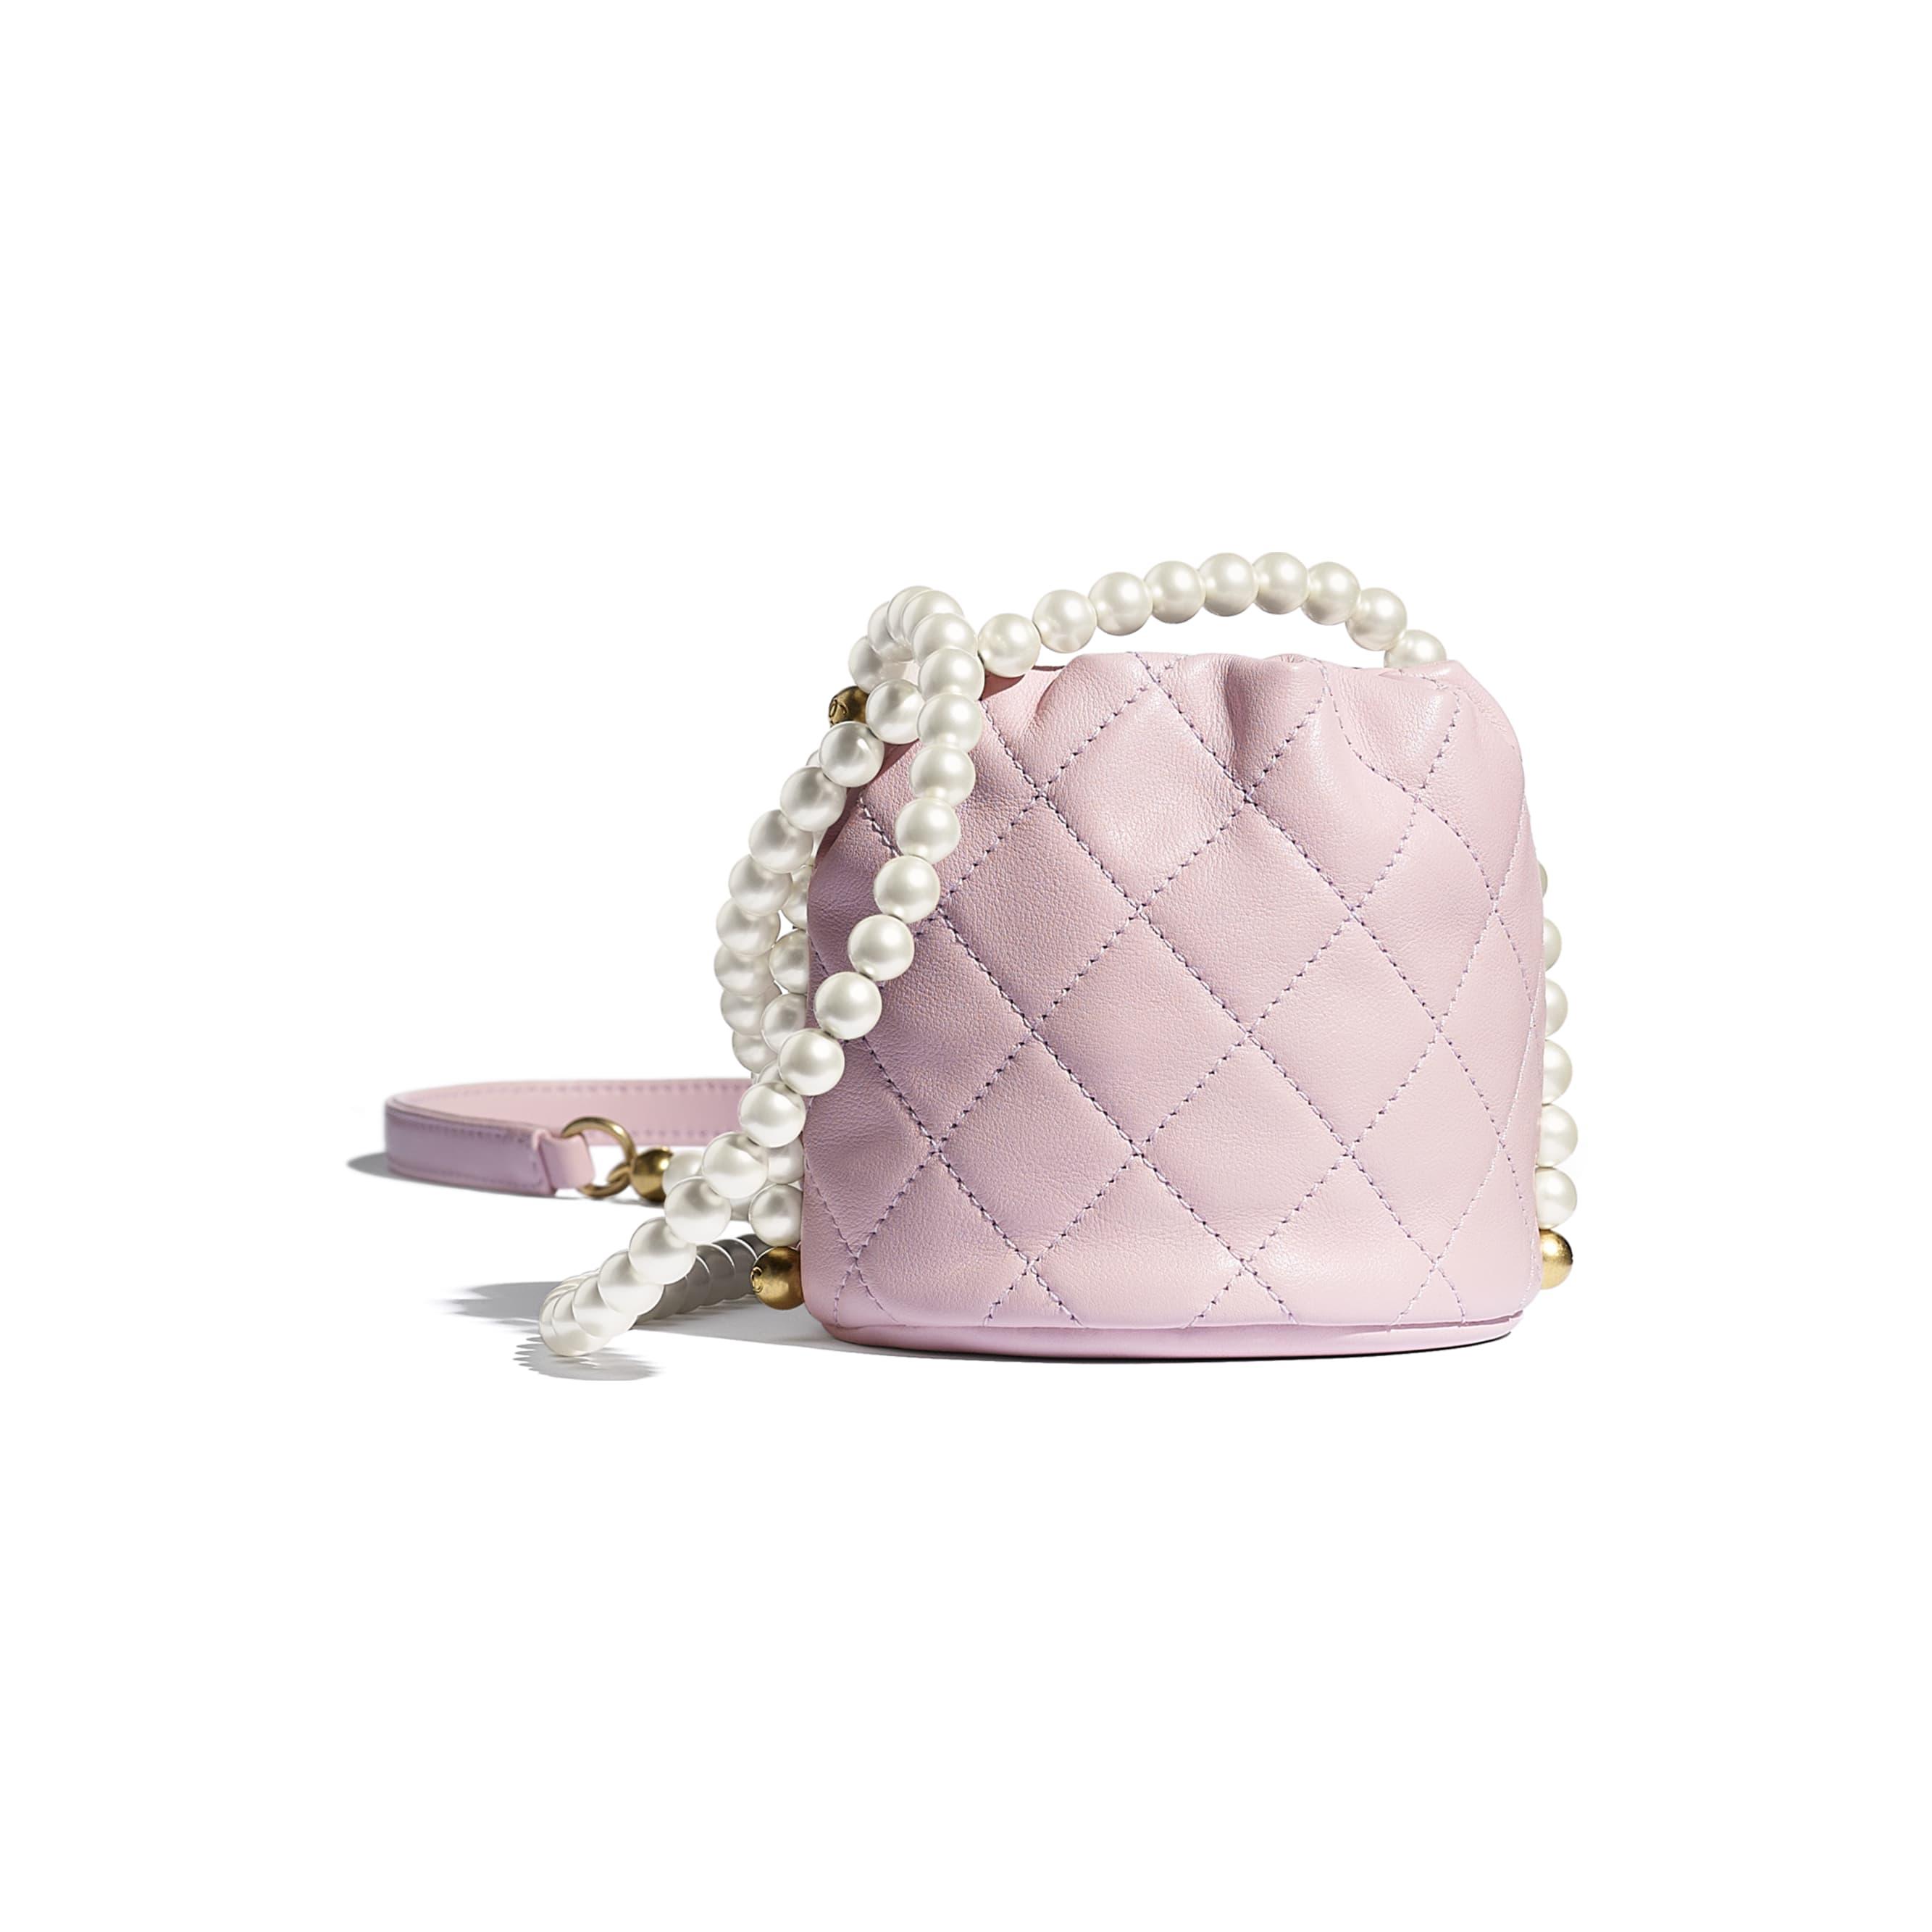 Mini Drawstring Bag - Light Pink - Calfskin, Imitation Pearls & Gold-Tone Metal - CHANEL - Alternative view - see standard sized version